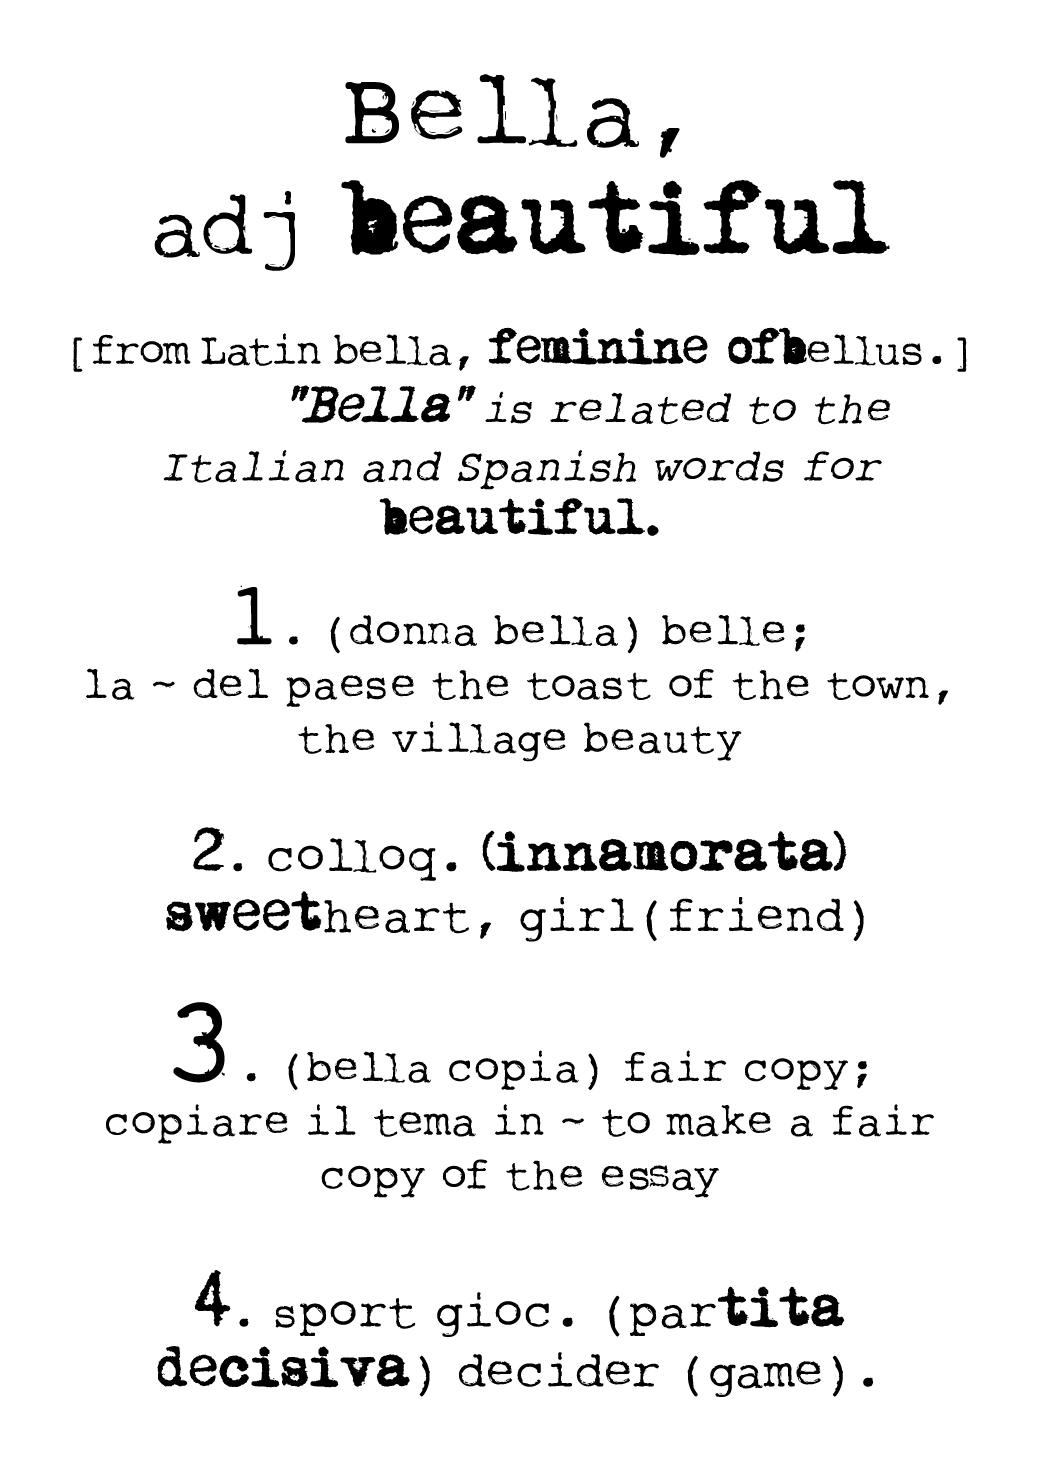 bella dictionary